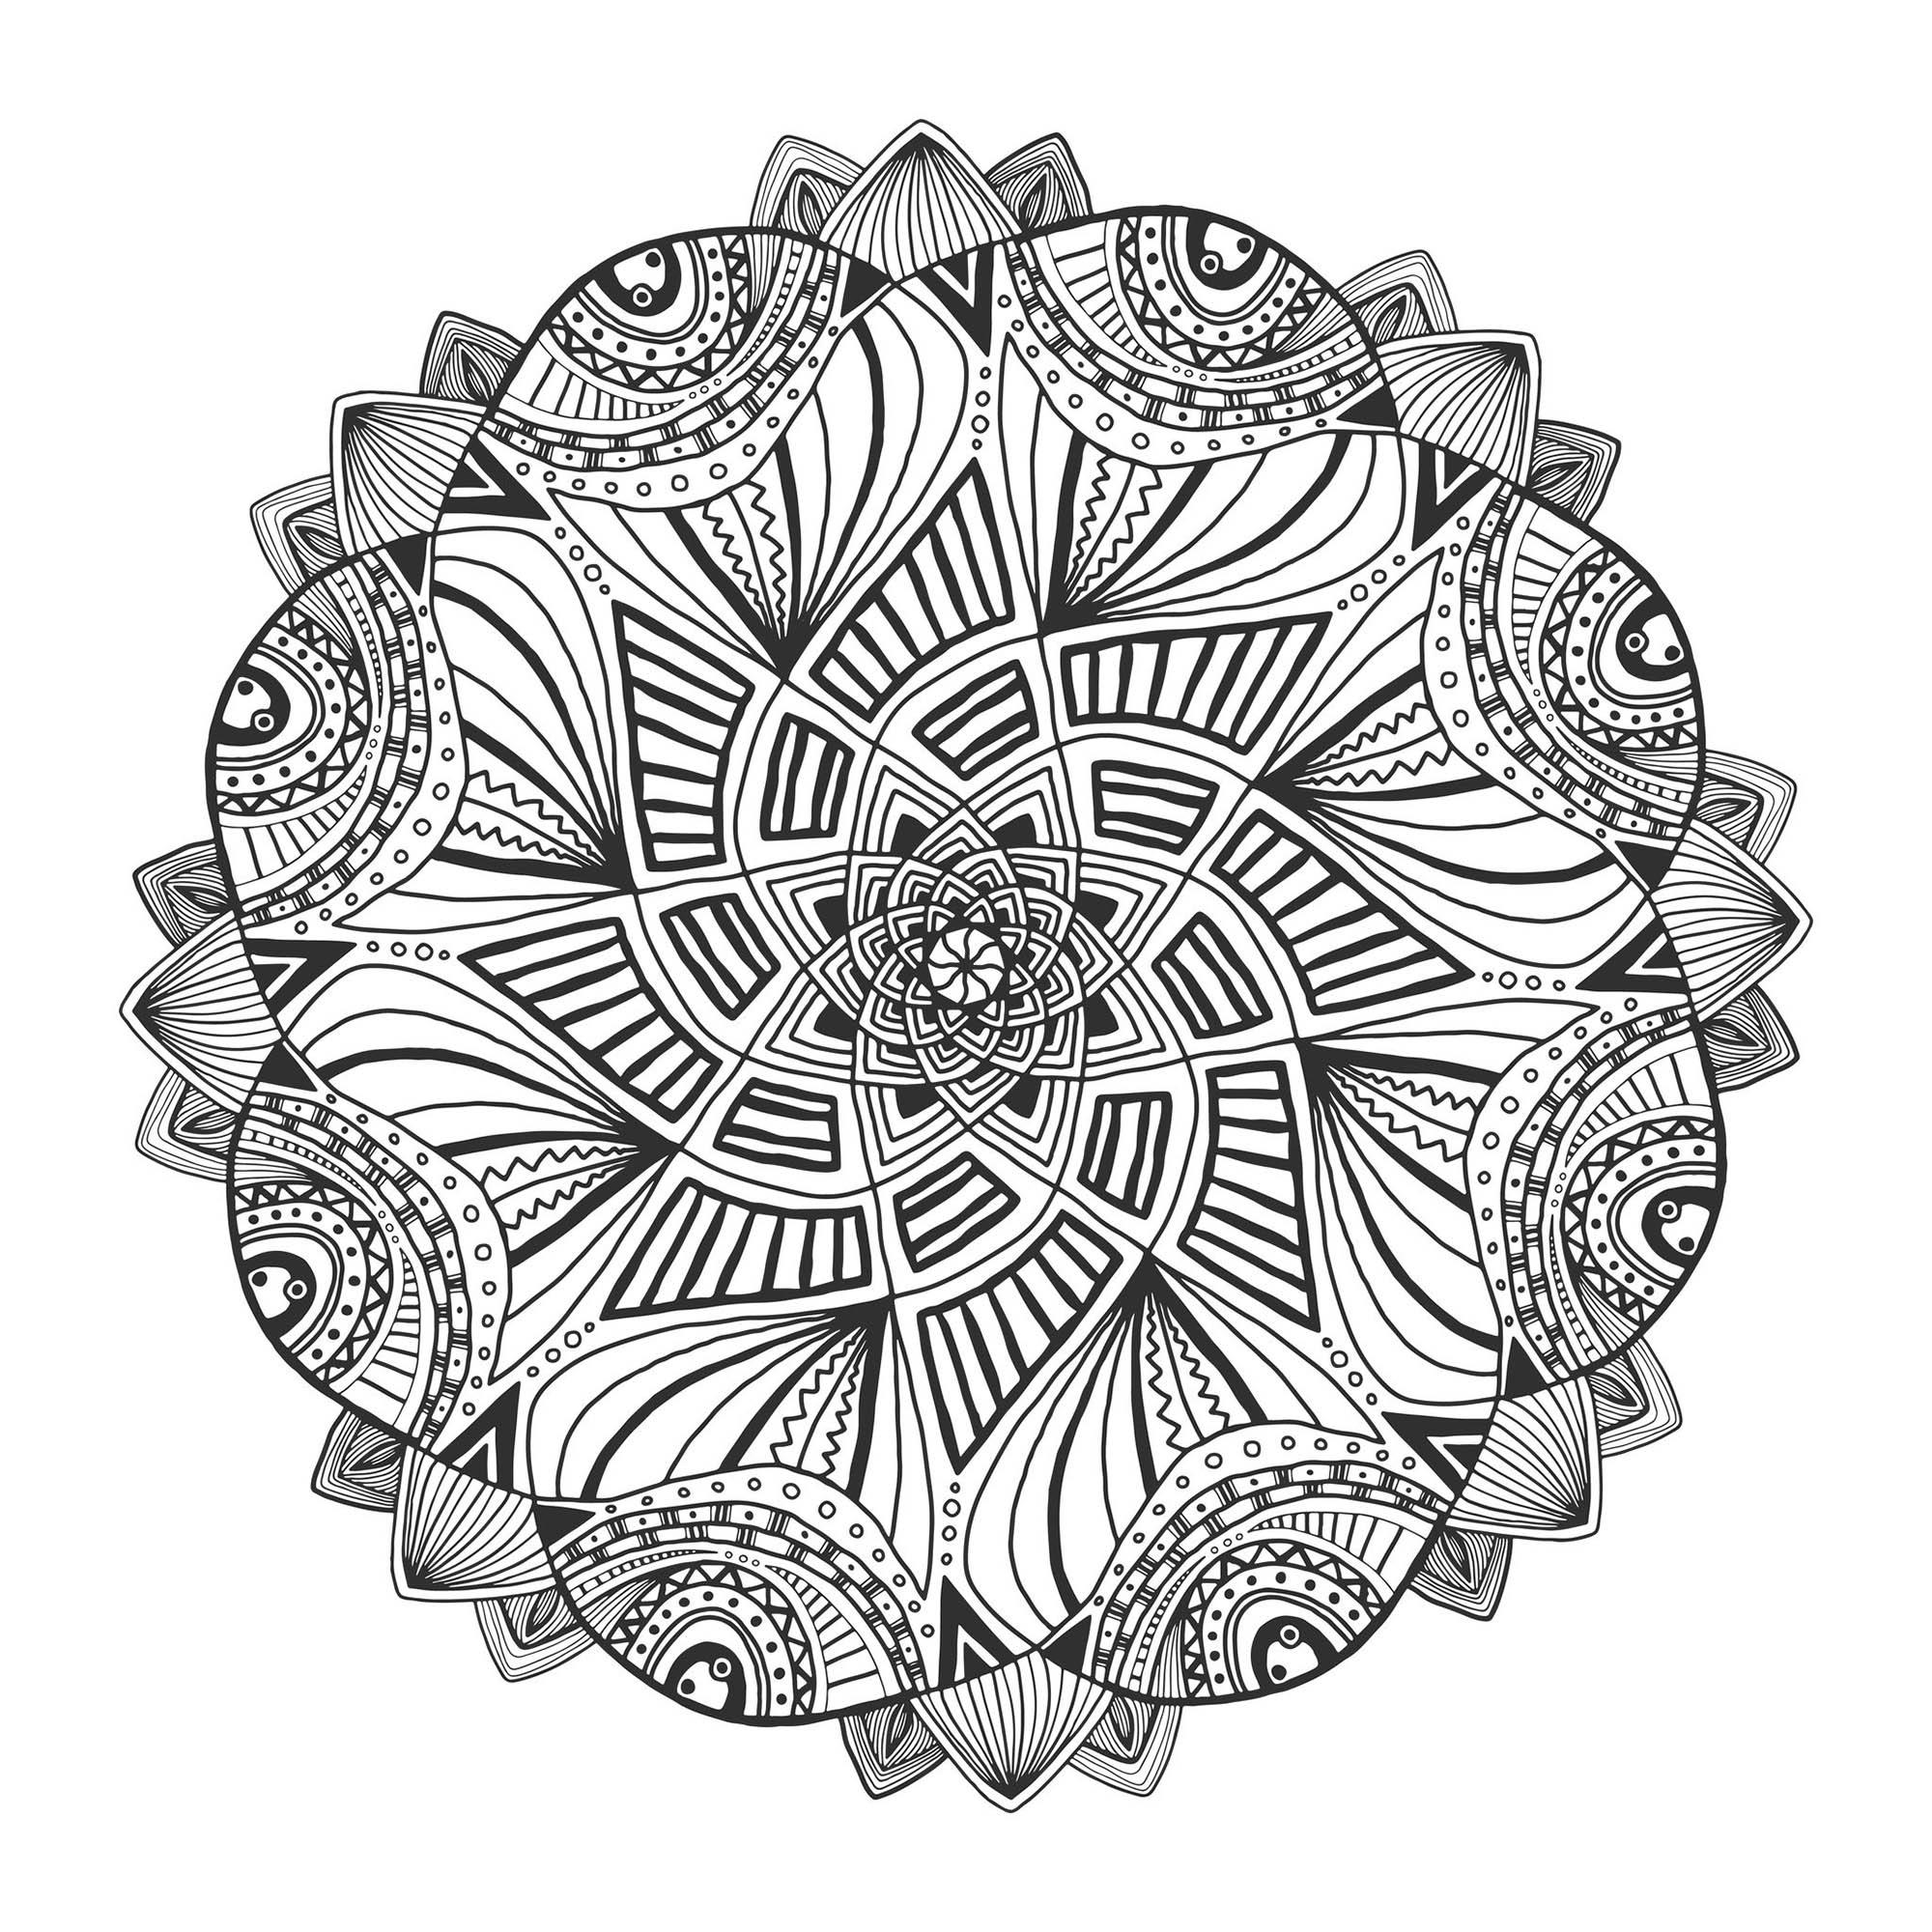 Ornamental Floral Mandala Mandalas Adult Coloring Pages